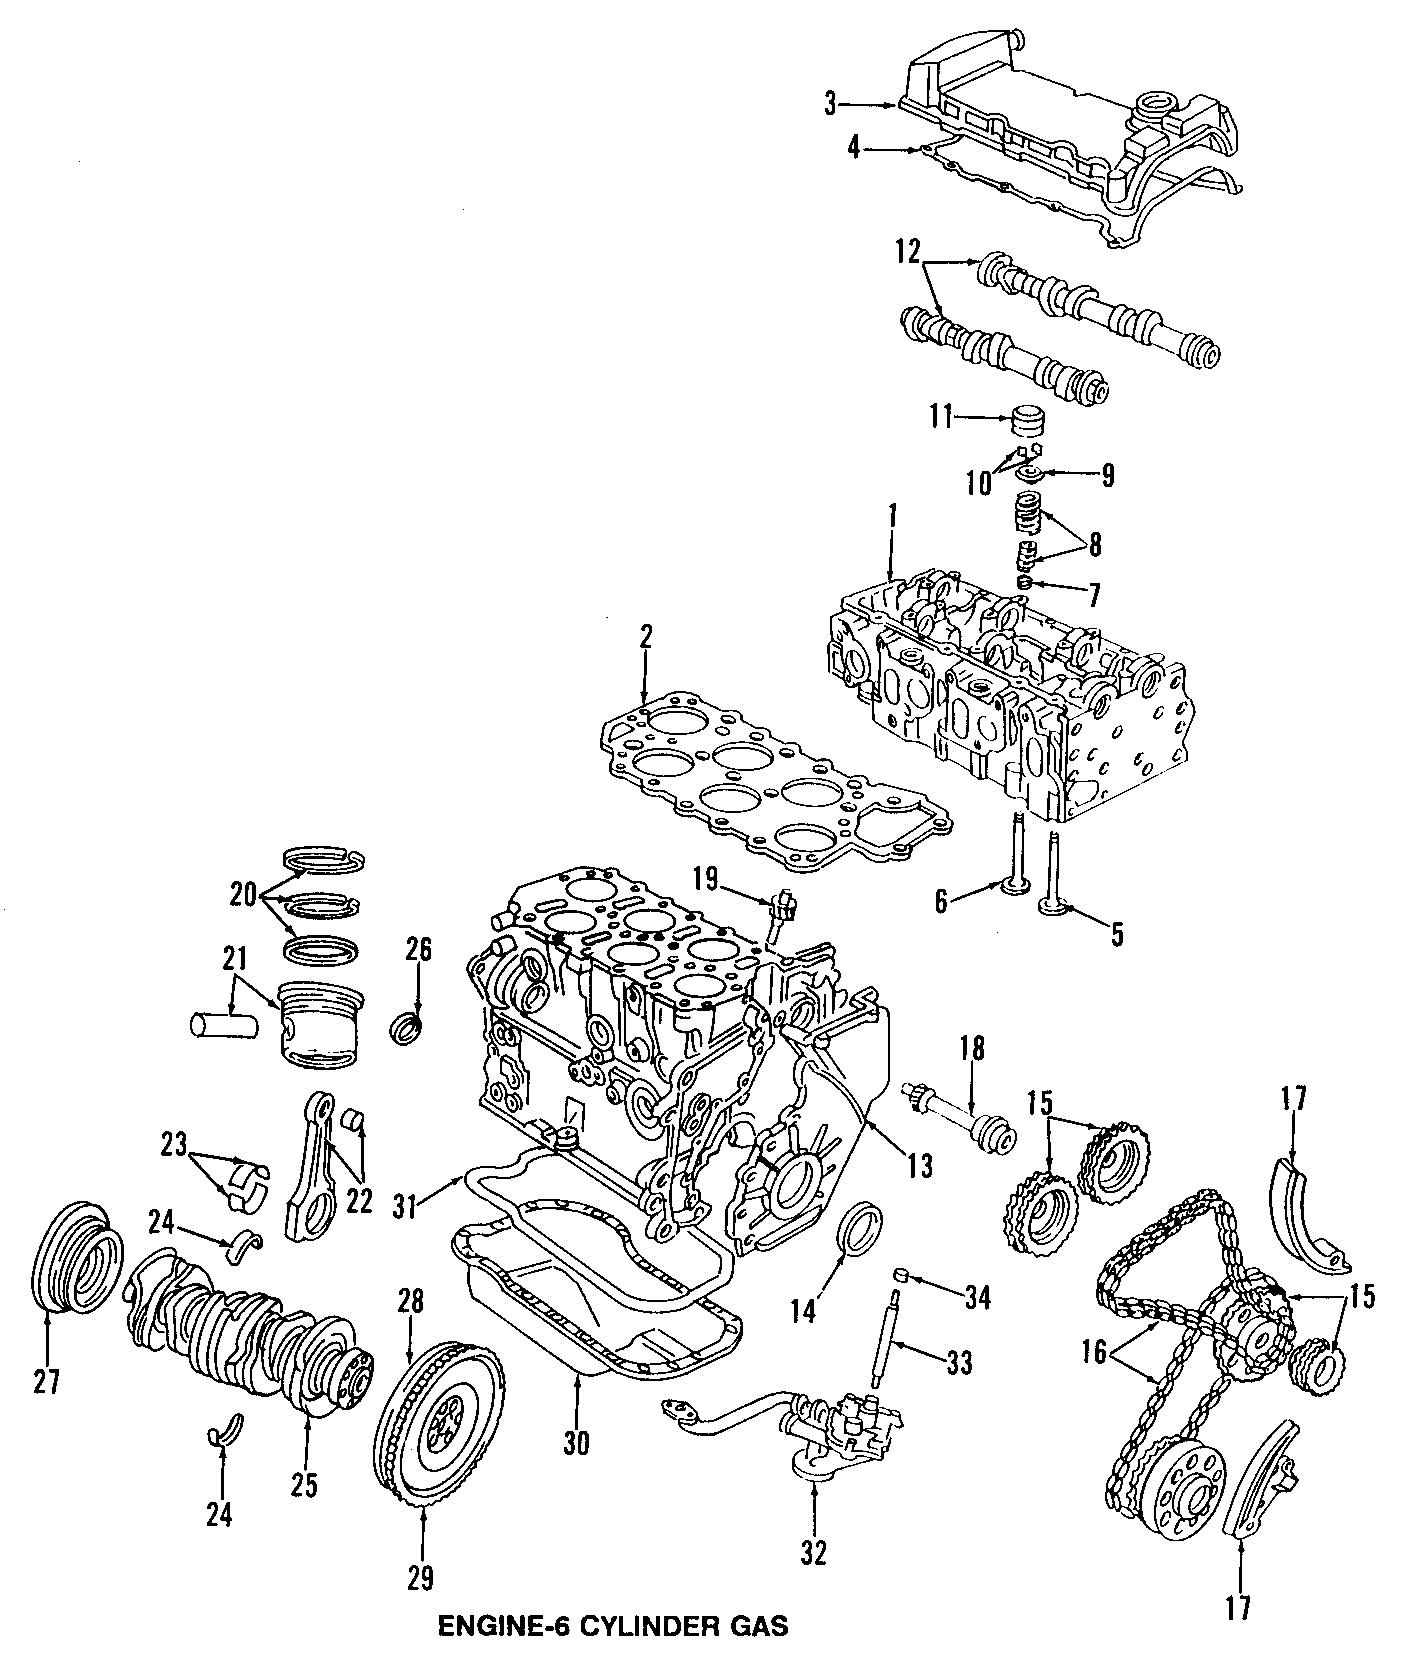 Volkswagen Jetta Engine Timing Camshaft Sprocket. Eurovan